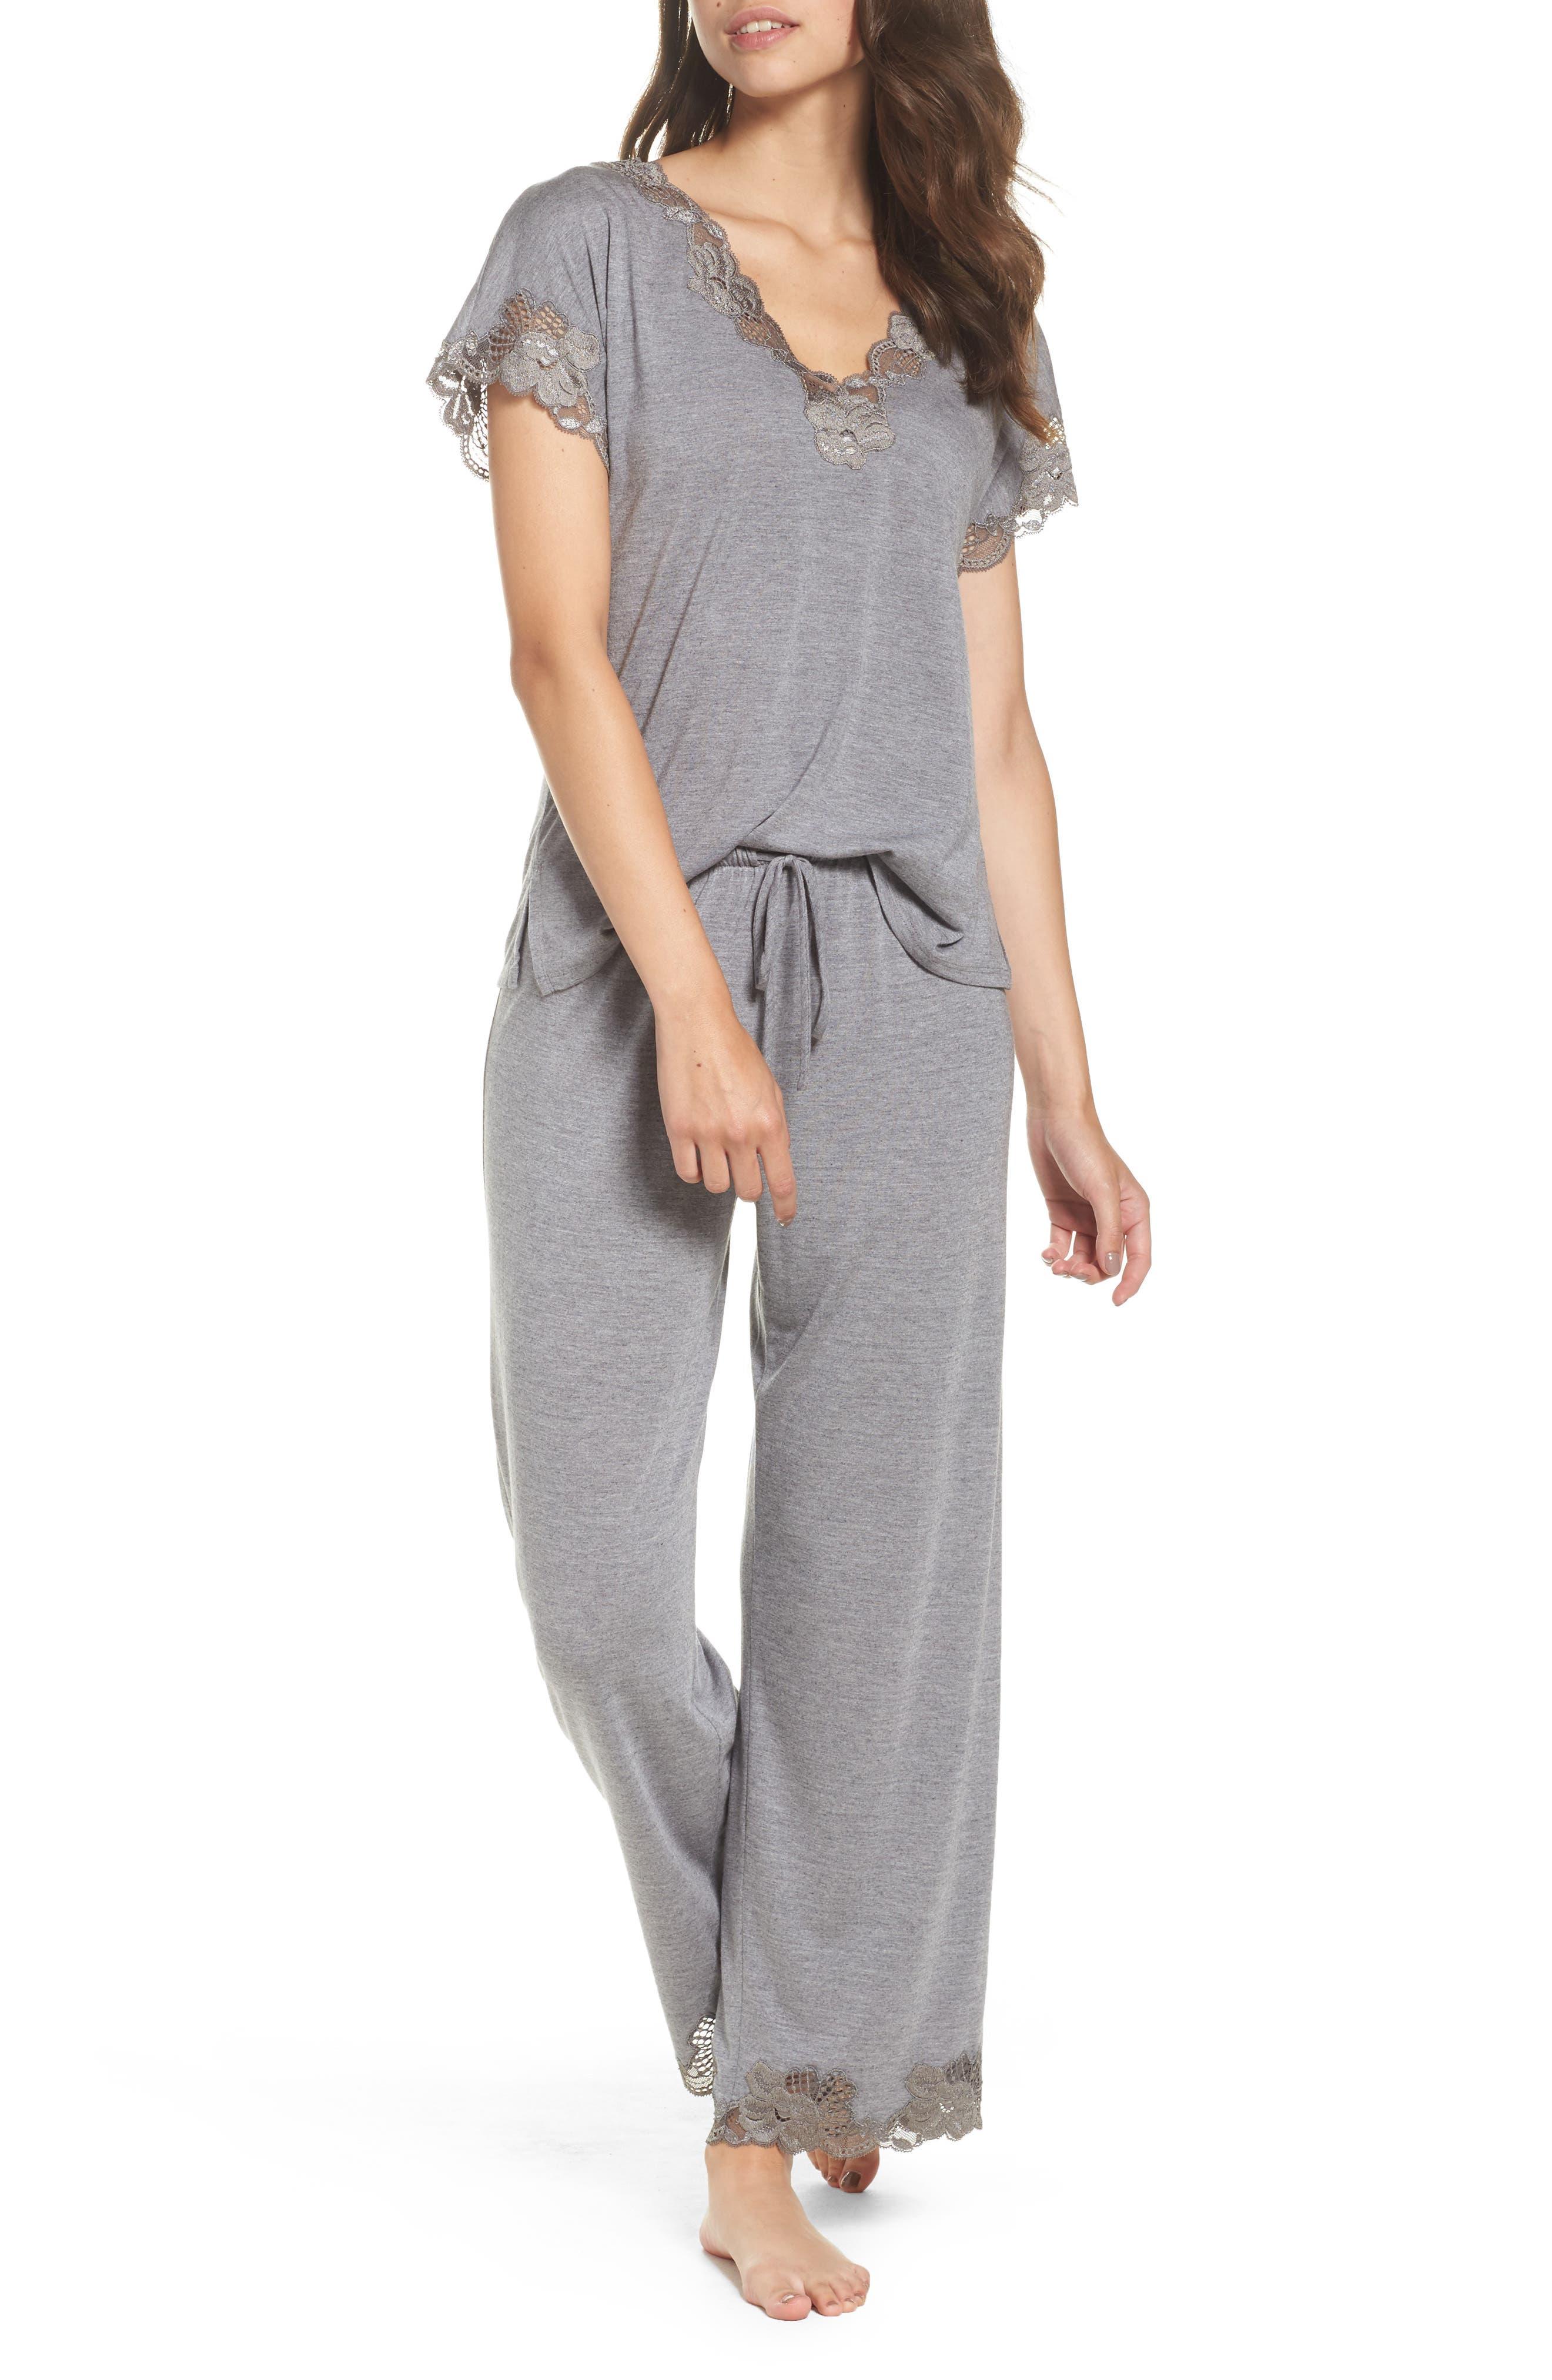 NATORI, 'Zen Floral' Pajama Set, Main thumbnail 1, color, 051